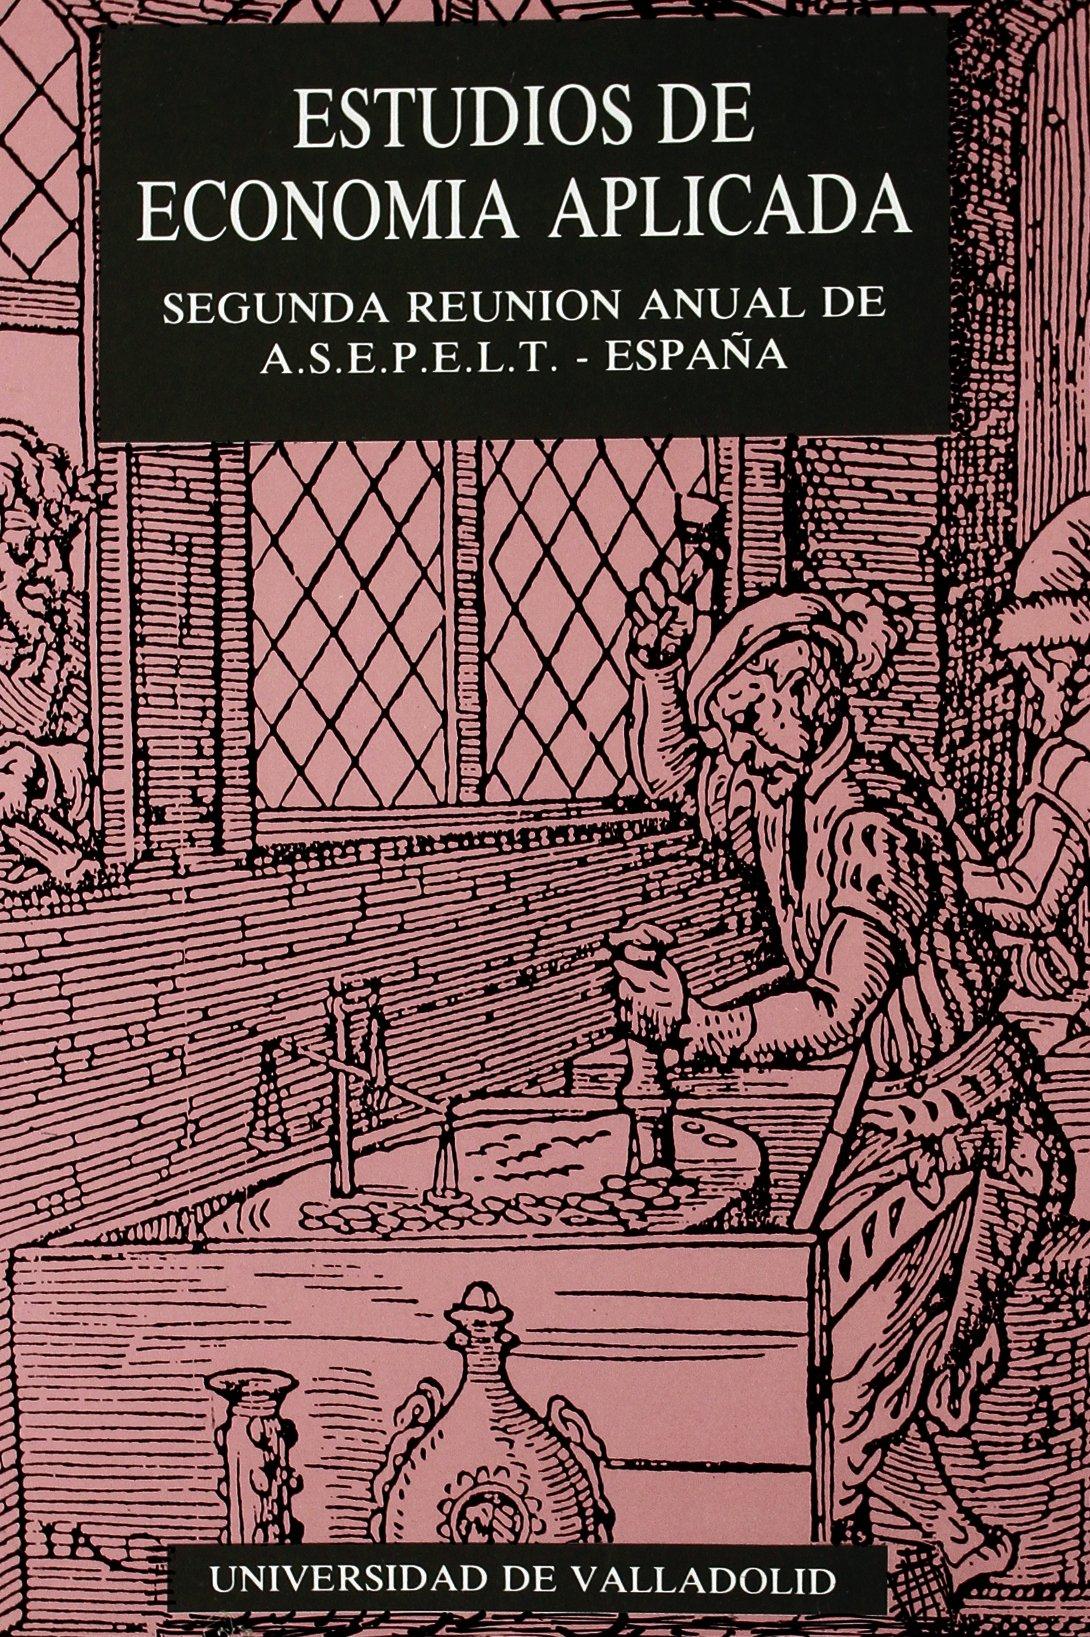 Estudios de Economia Aplicada. Segunda Reunión Anual de Asepelt- España: Amazon.es: Pena Trapero, Jesus Bernardo: Libros